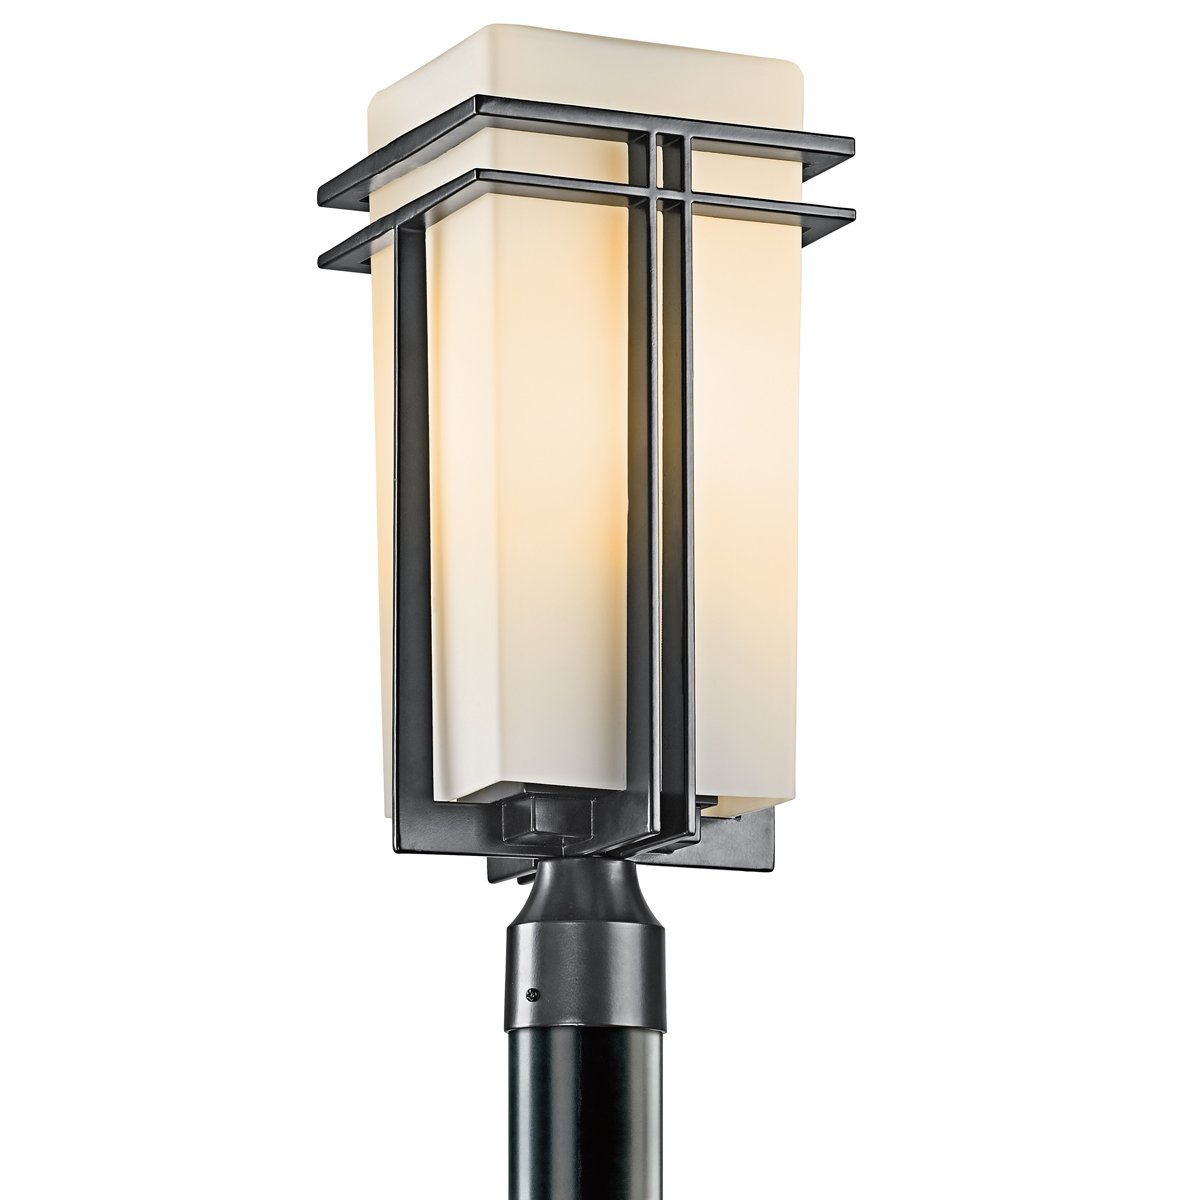 Kichler 49207BK One Light Outdoor Post Mount